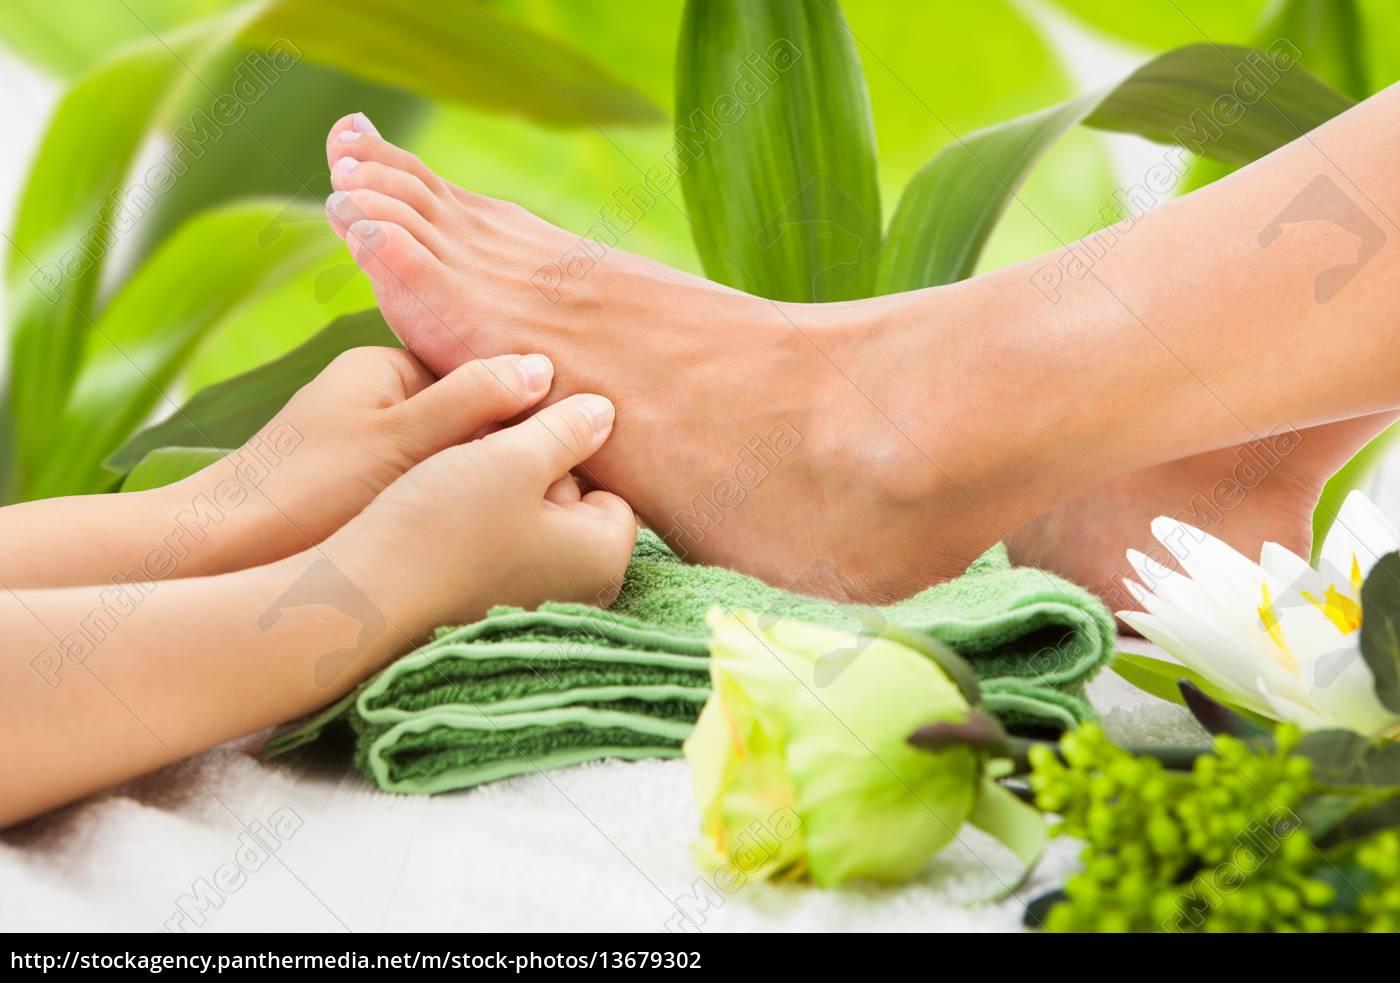 woman, feet, undergoing, massage - 13679302